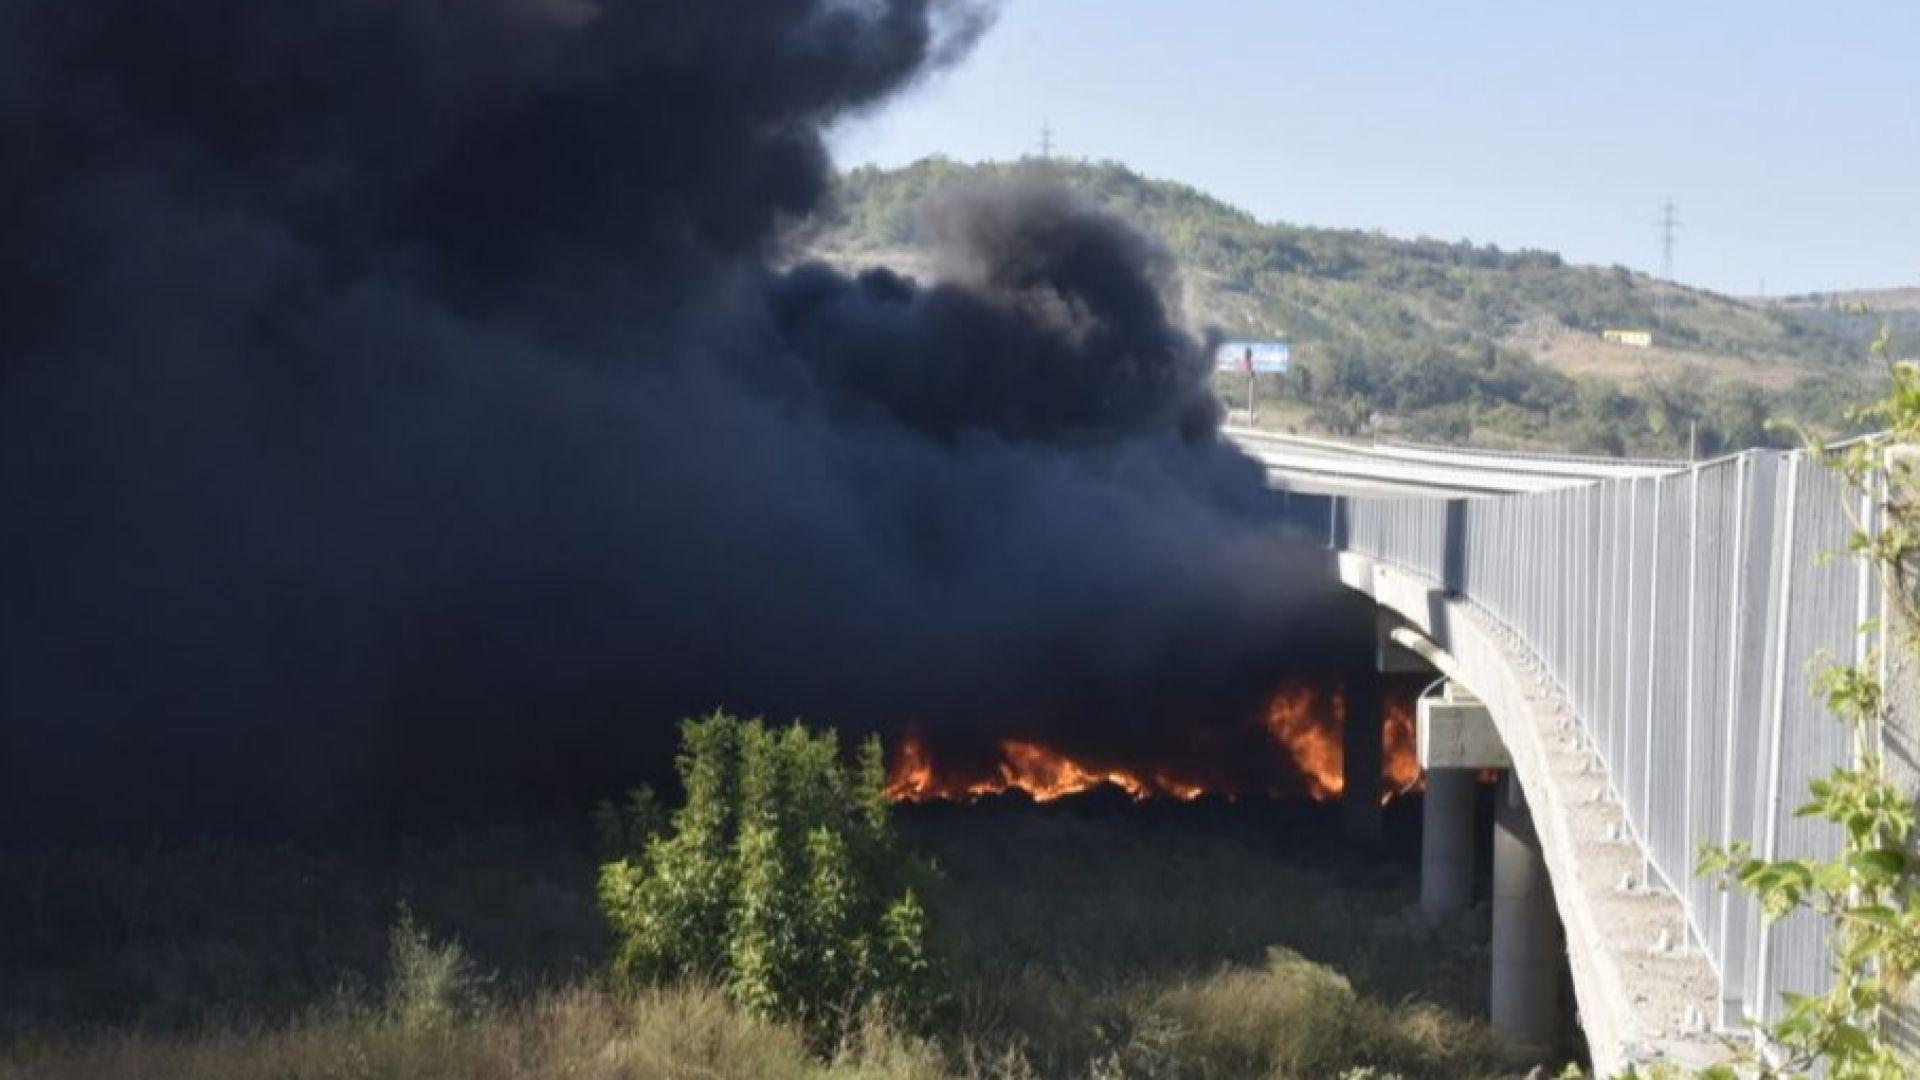 Дупница частично бедствено заради пожара на АМ Струма. Усложена е